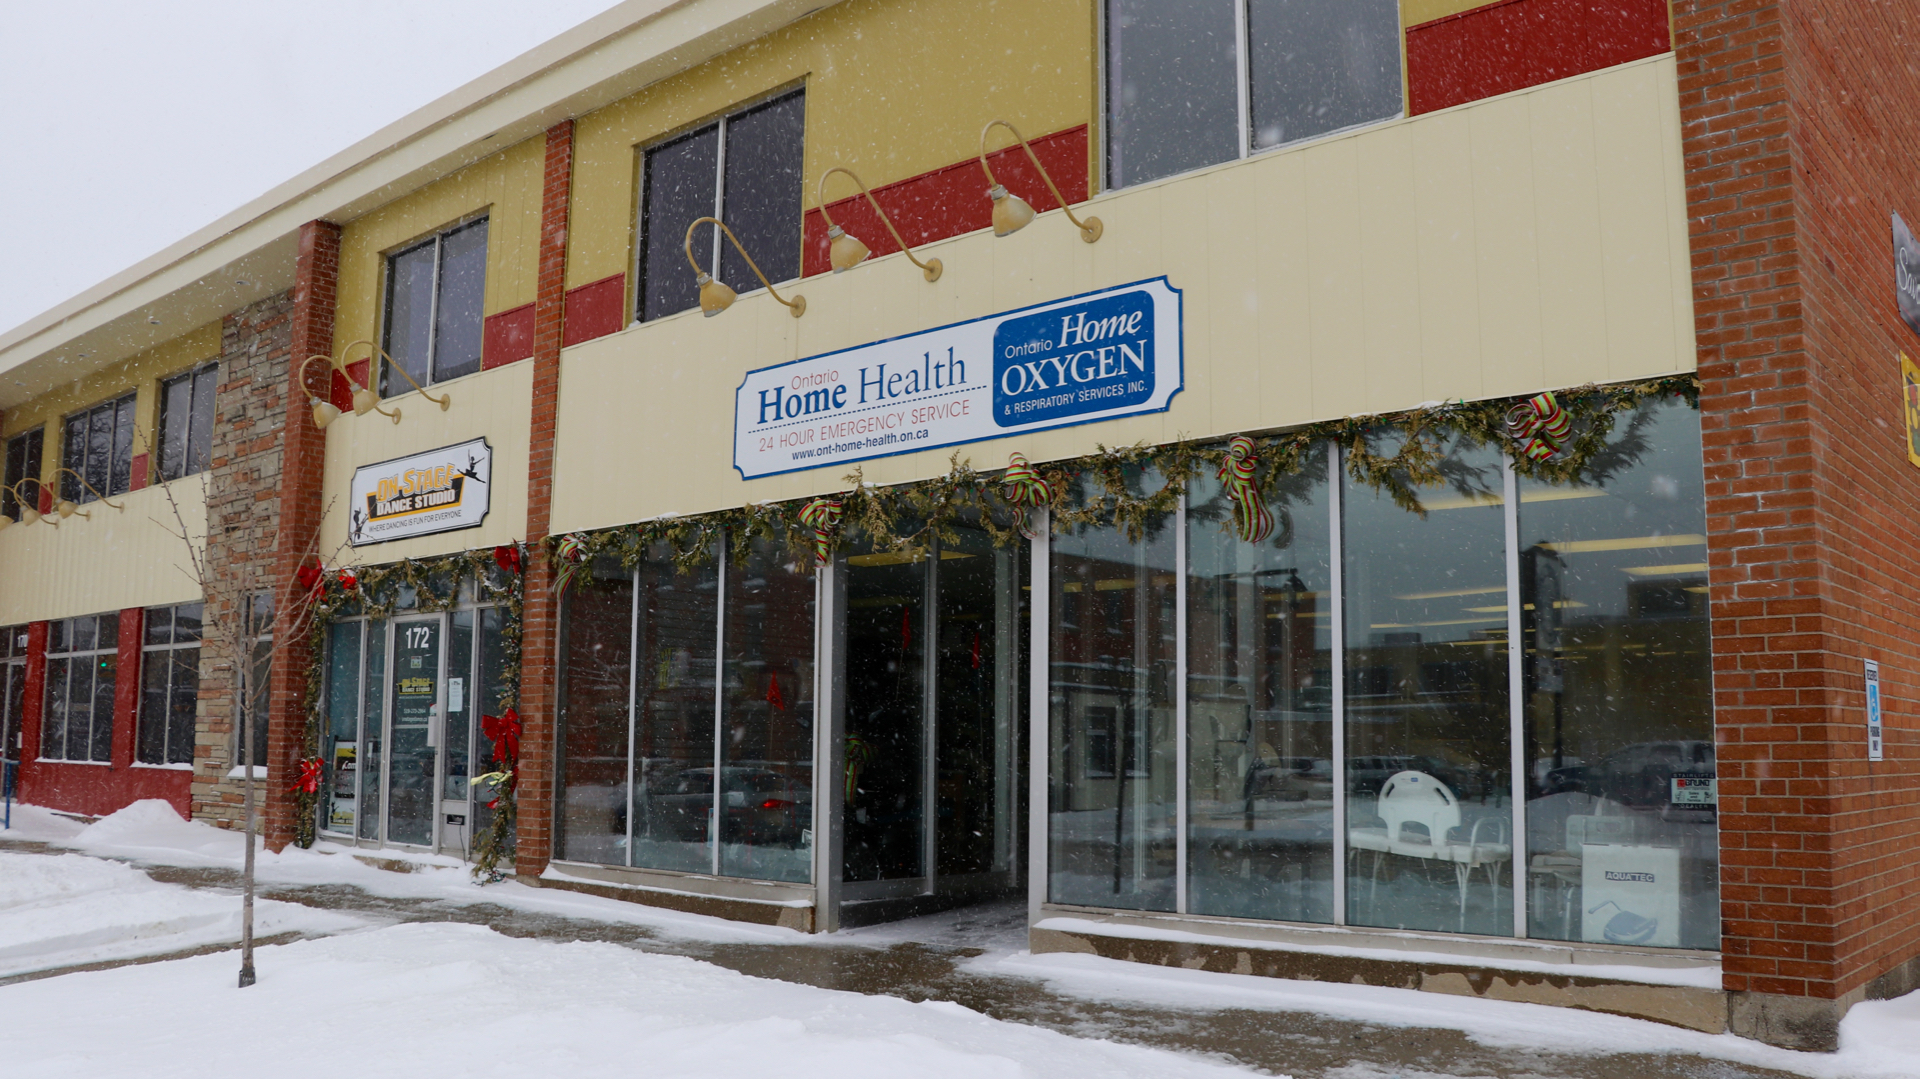 Ontario Home Oxygen & Health in Orangeville